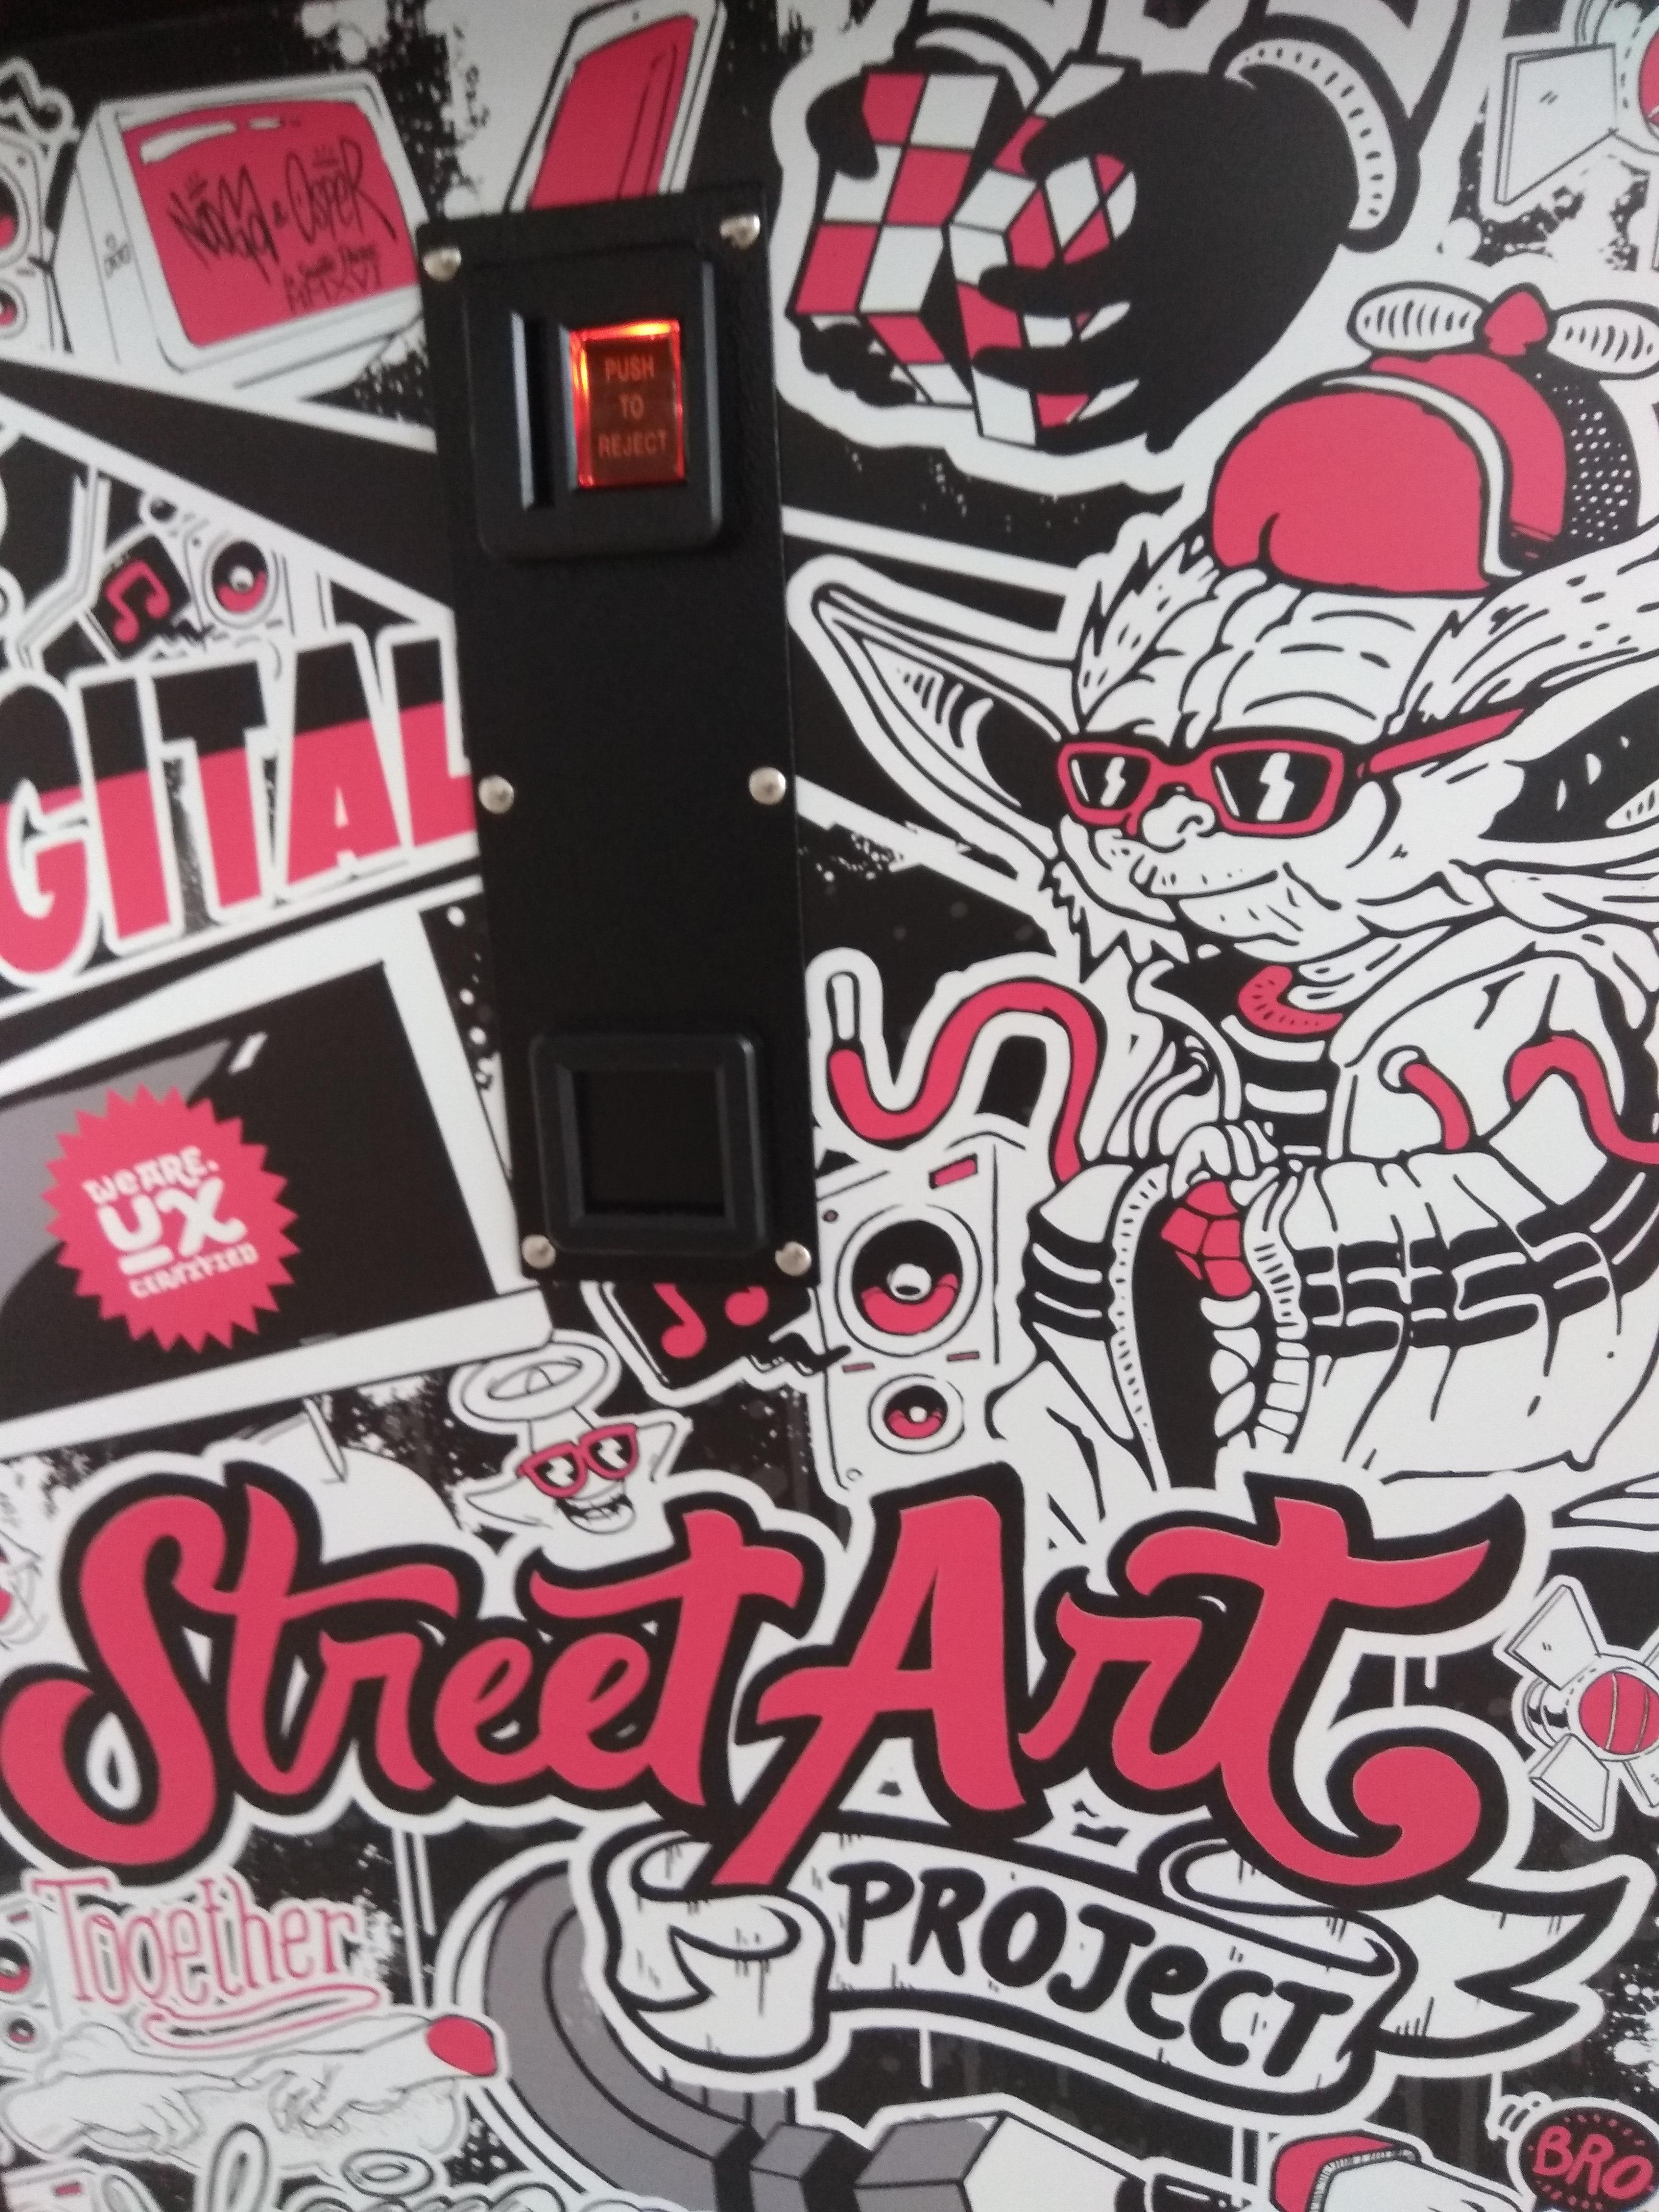 Borne d'arcade Street Art